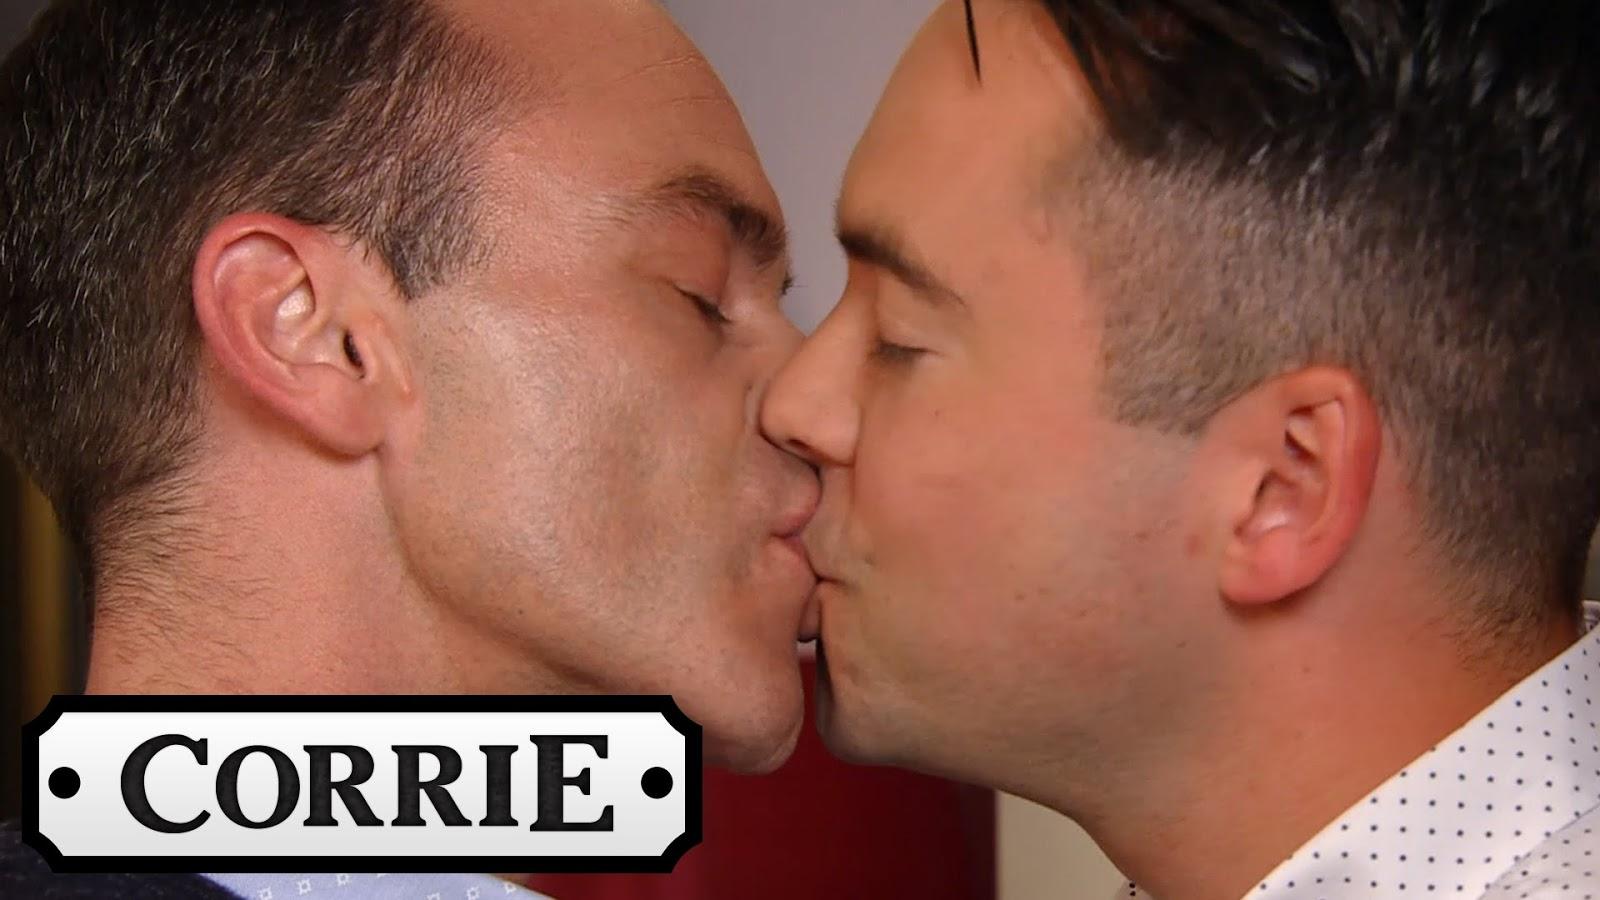 gay men in argentina